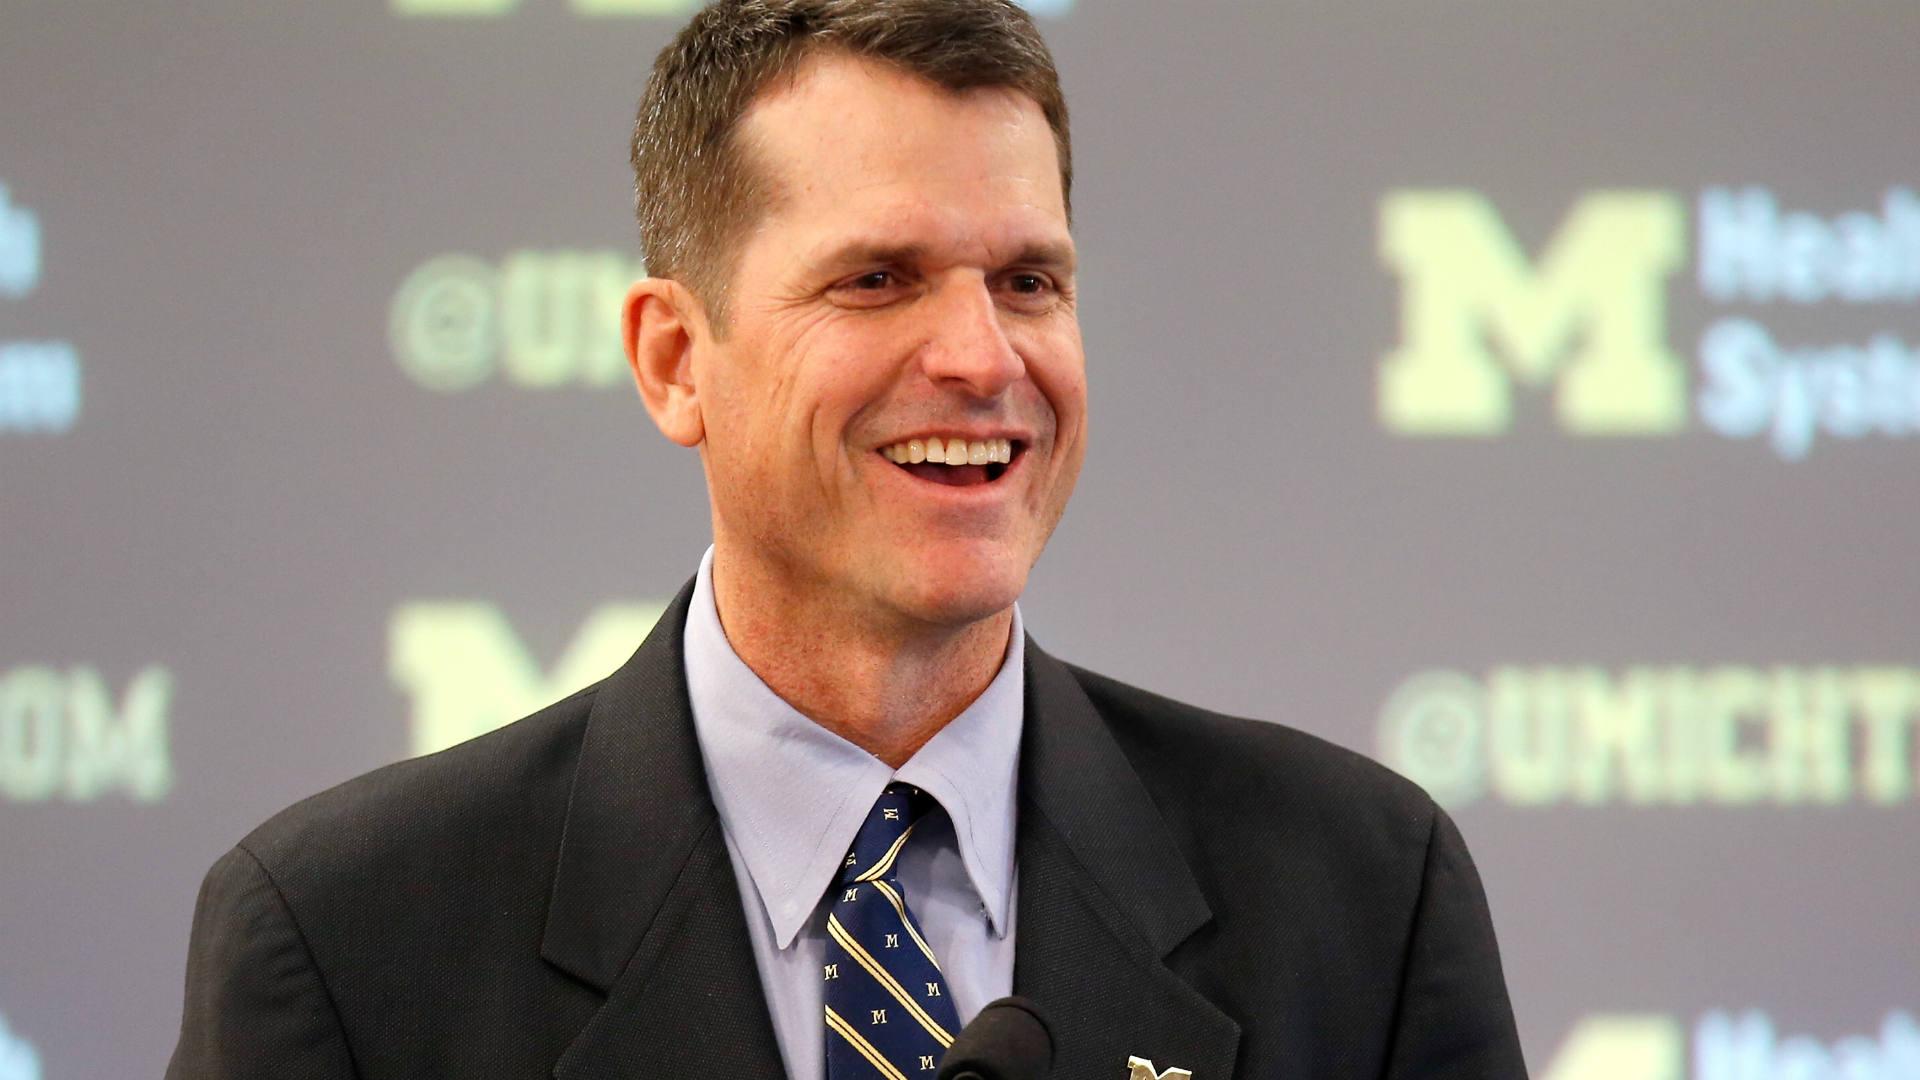 Jim Harbaugh at University of Michigan